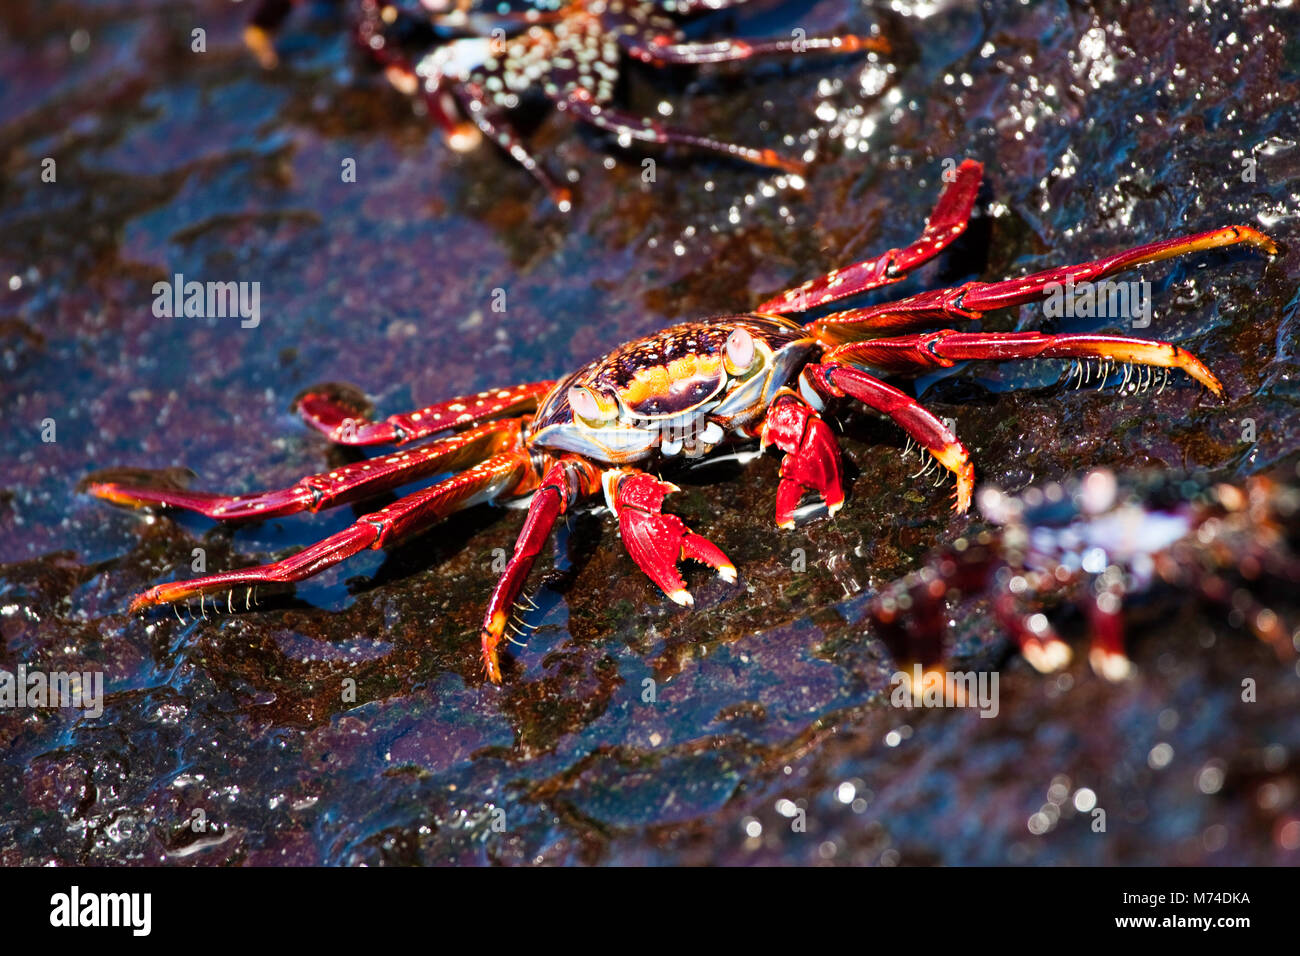 A Sally Lightfoot Crab, Graspus graspus, searching for algae to dine on in the intertidal zone, Santa Cruz Island, - Stock Image